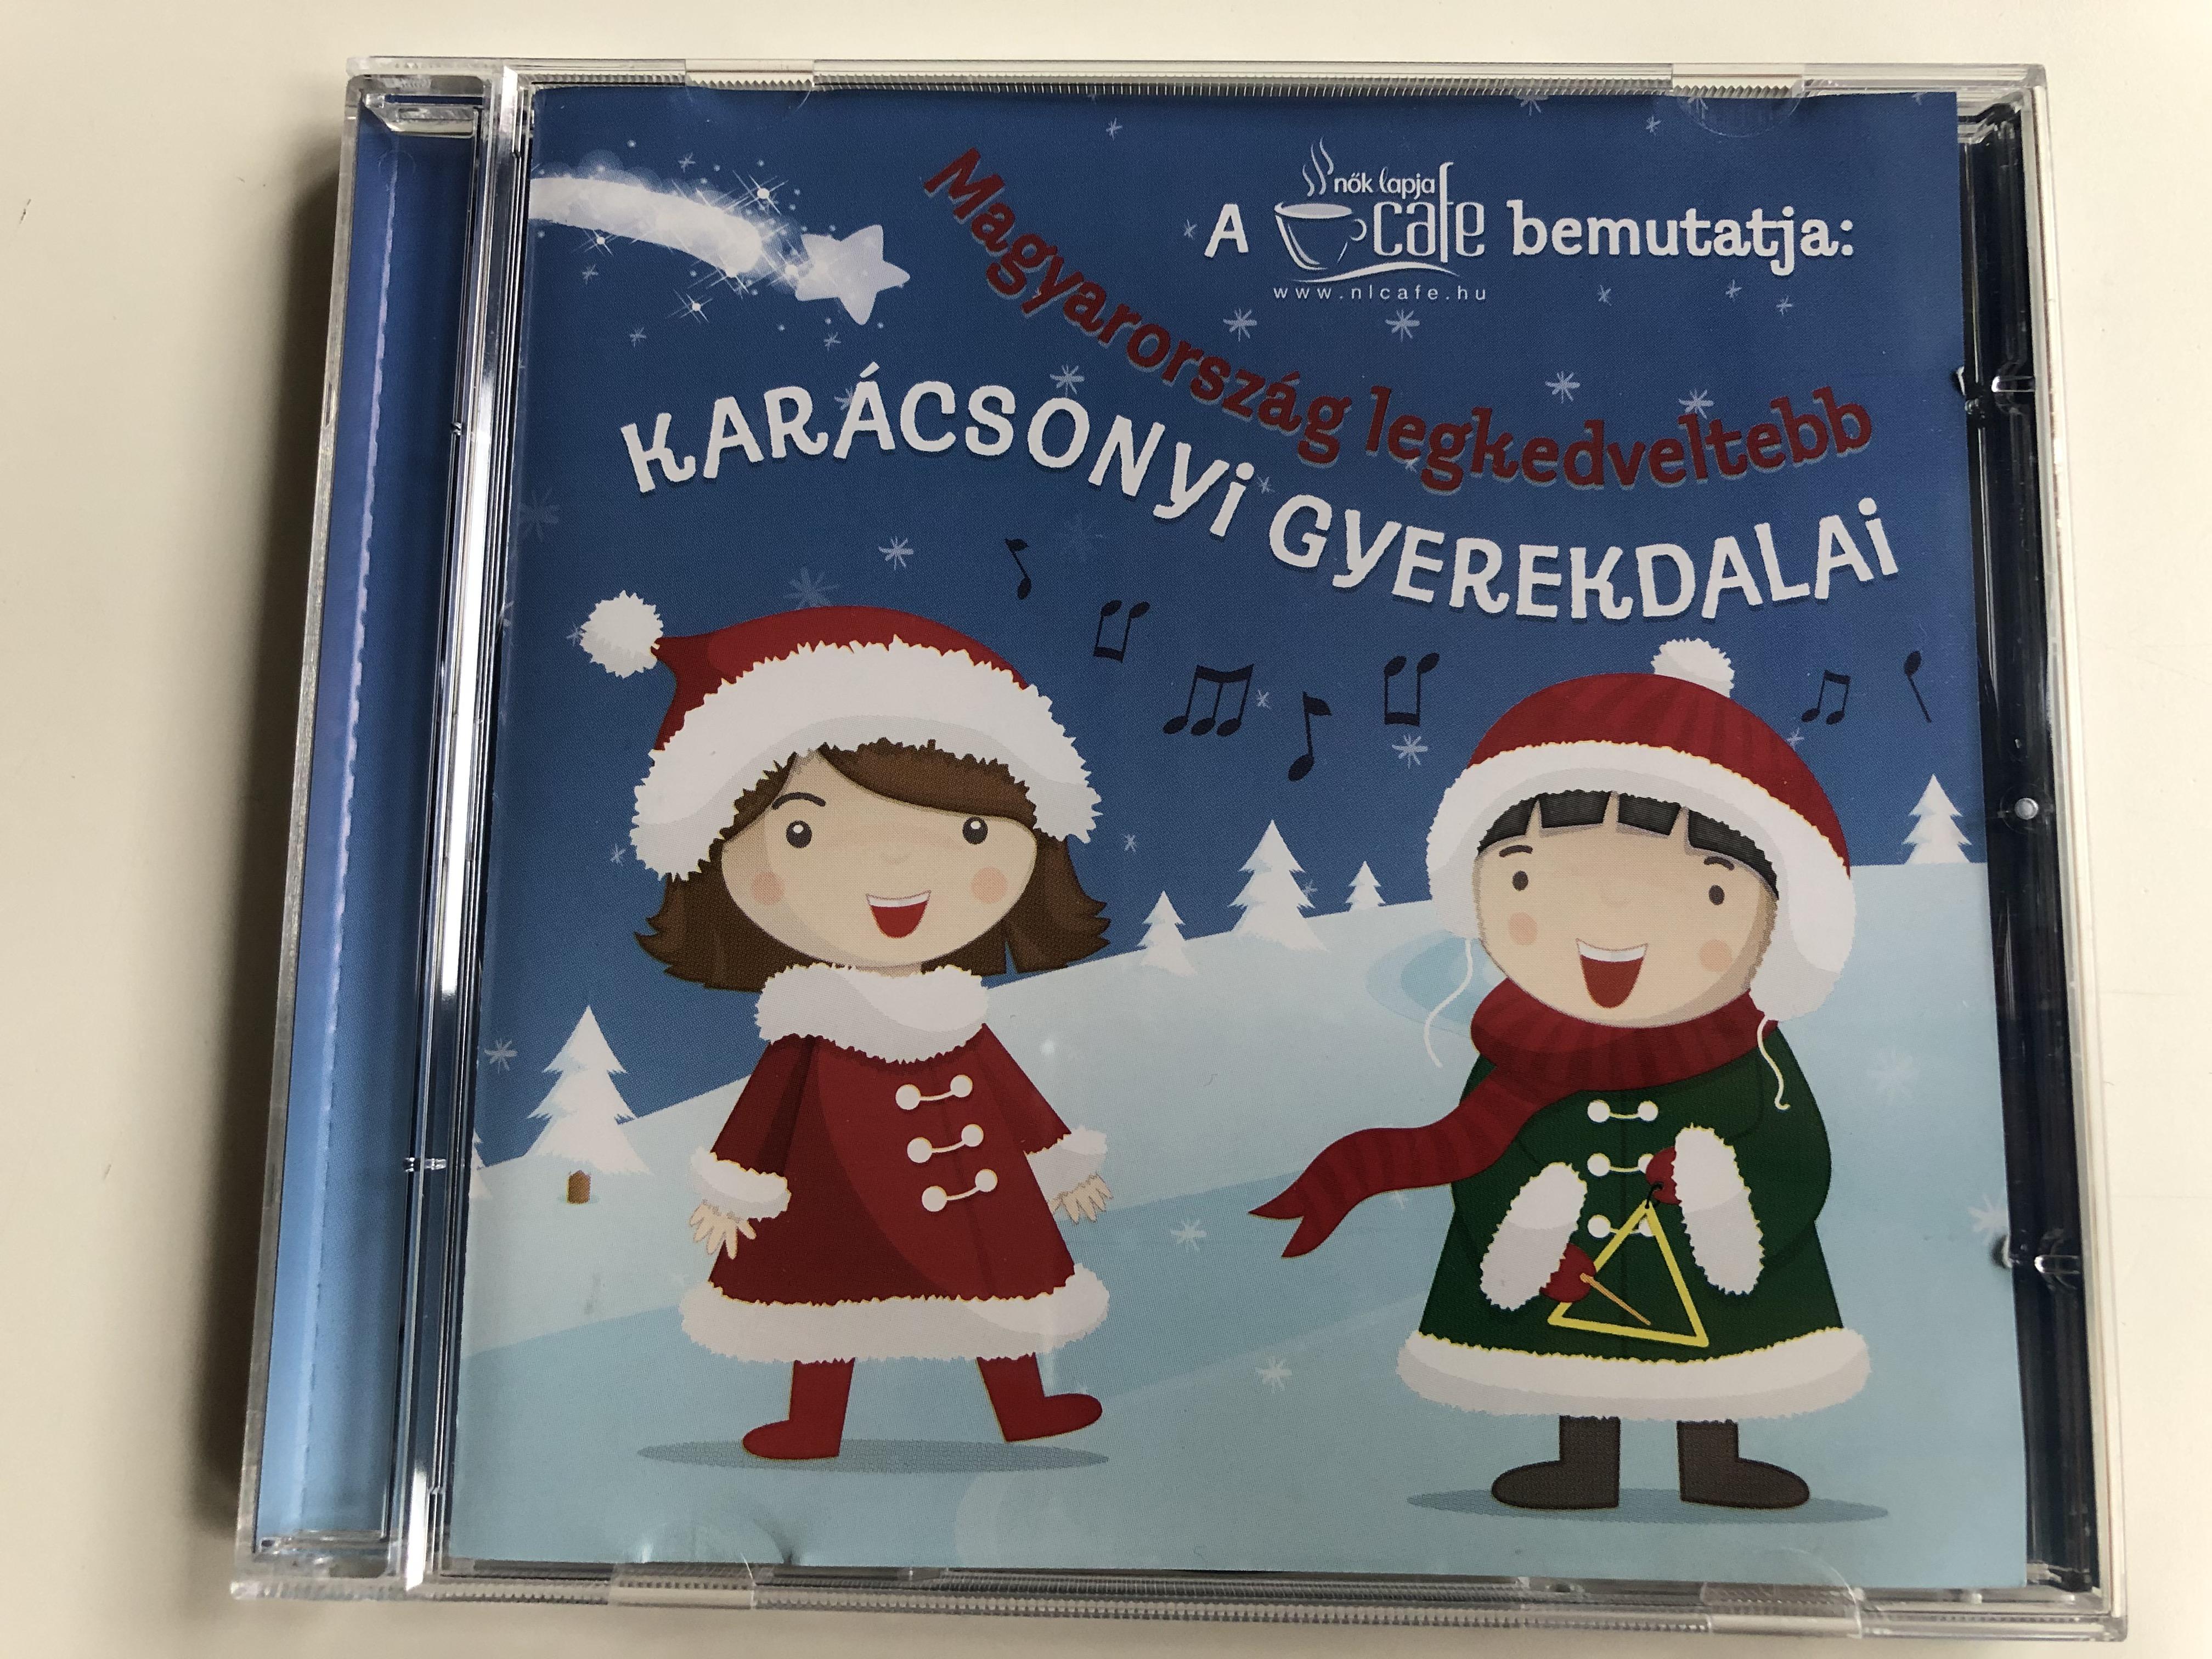 magyarorszag-legkedveltebb-karacsonyi-gyerekdalai-univerzal-music-audio-cd-2011-2787063-1-.jpg